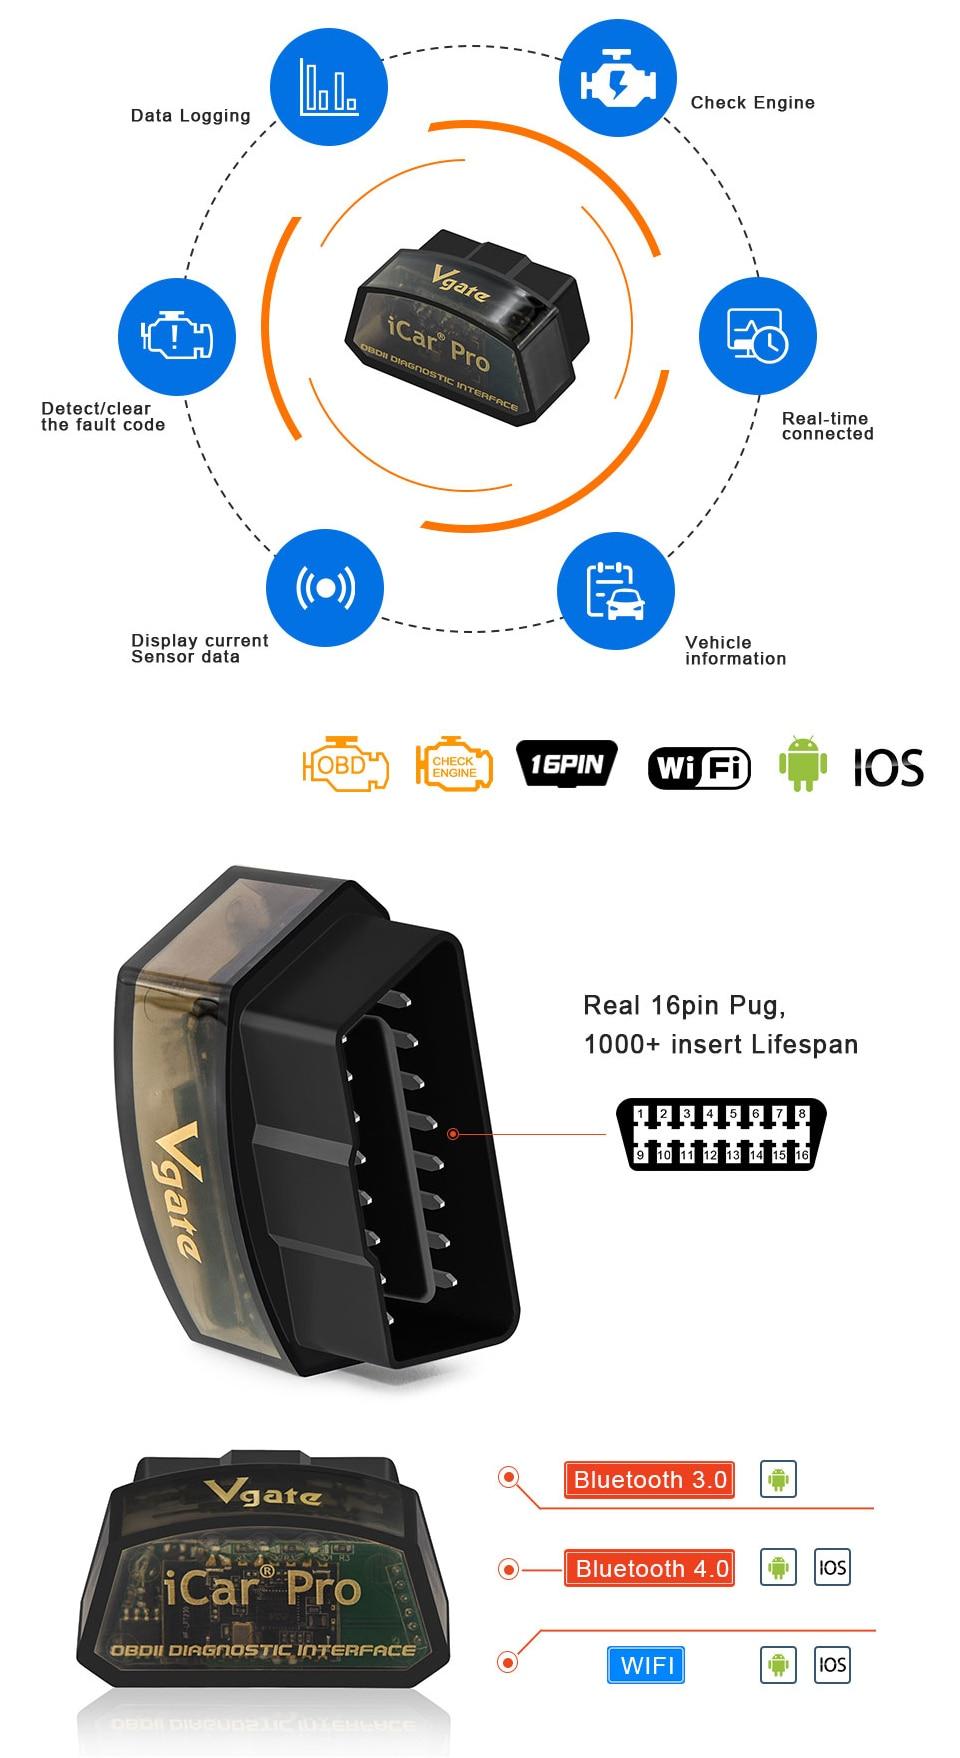 HTB1kT6WI4naK1RjSZFtq6zC2VXaV Vgate iCar Pro Bluetooth 4.0/3.0/WIFI OBD2 Scanner For Android/IOS Auto Elm 327 Car Diagnostic Tool ELM327 V2.1 Code Reader